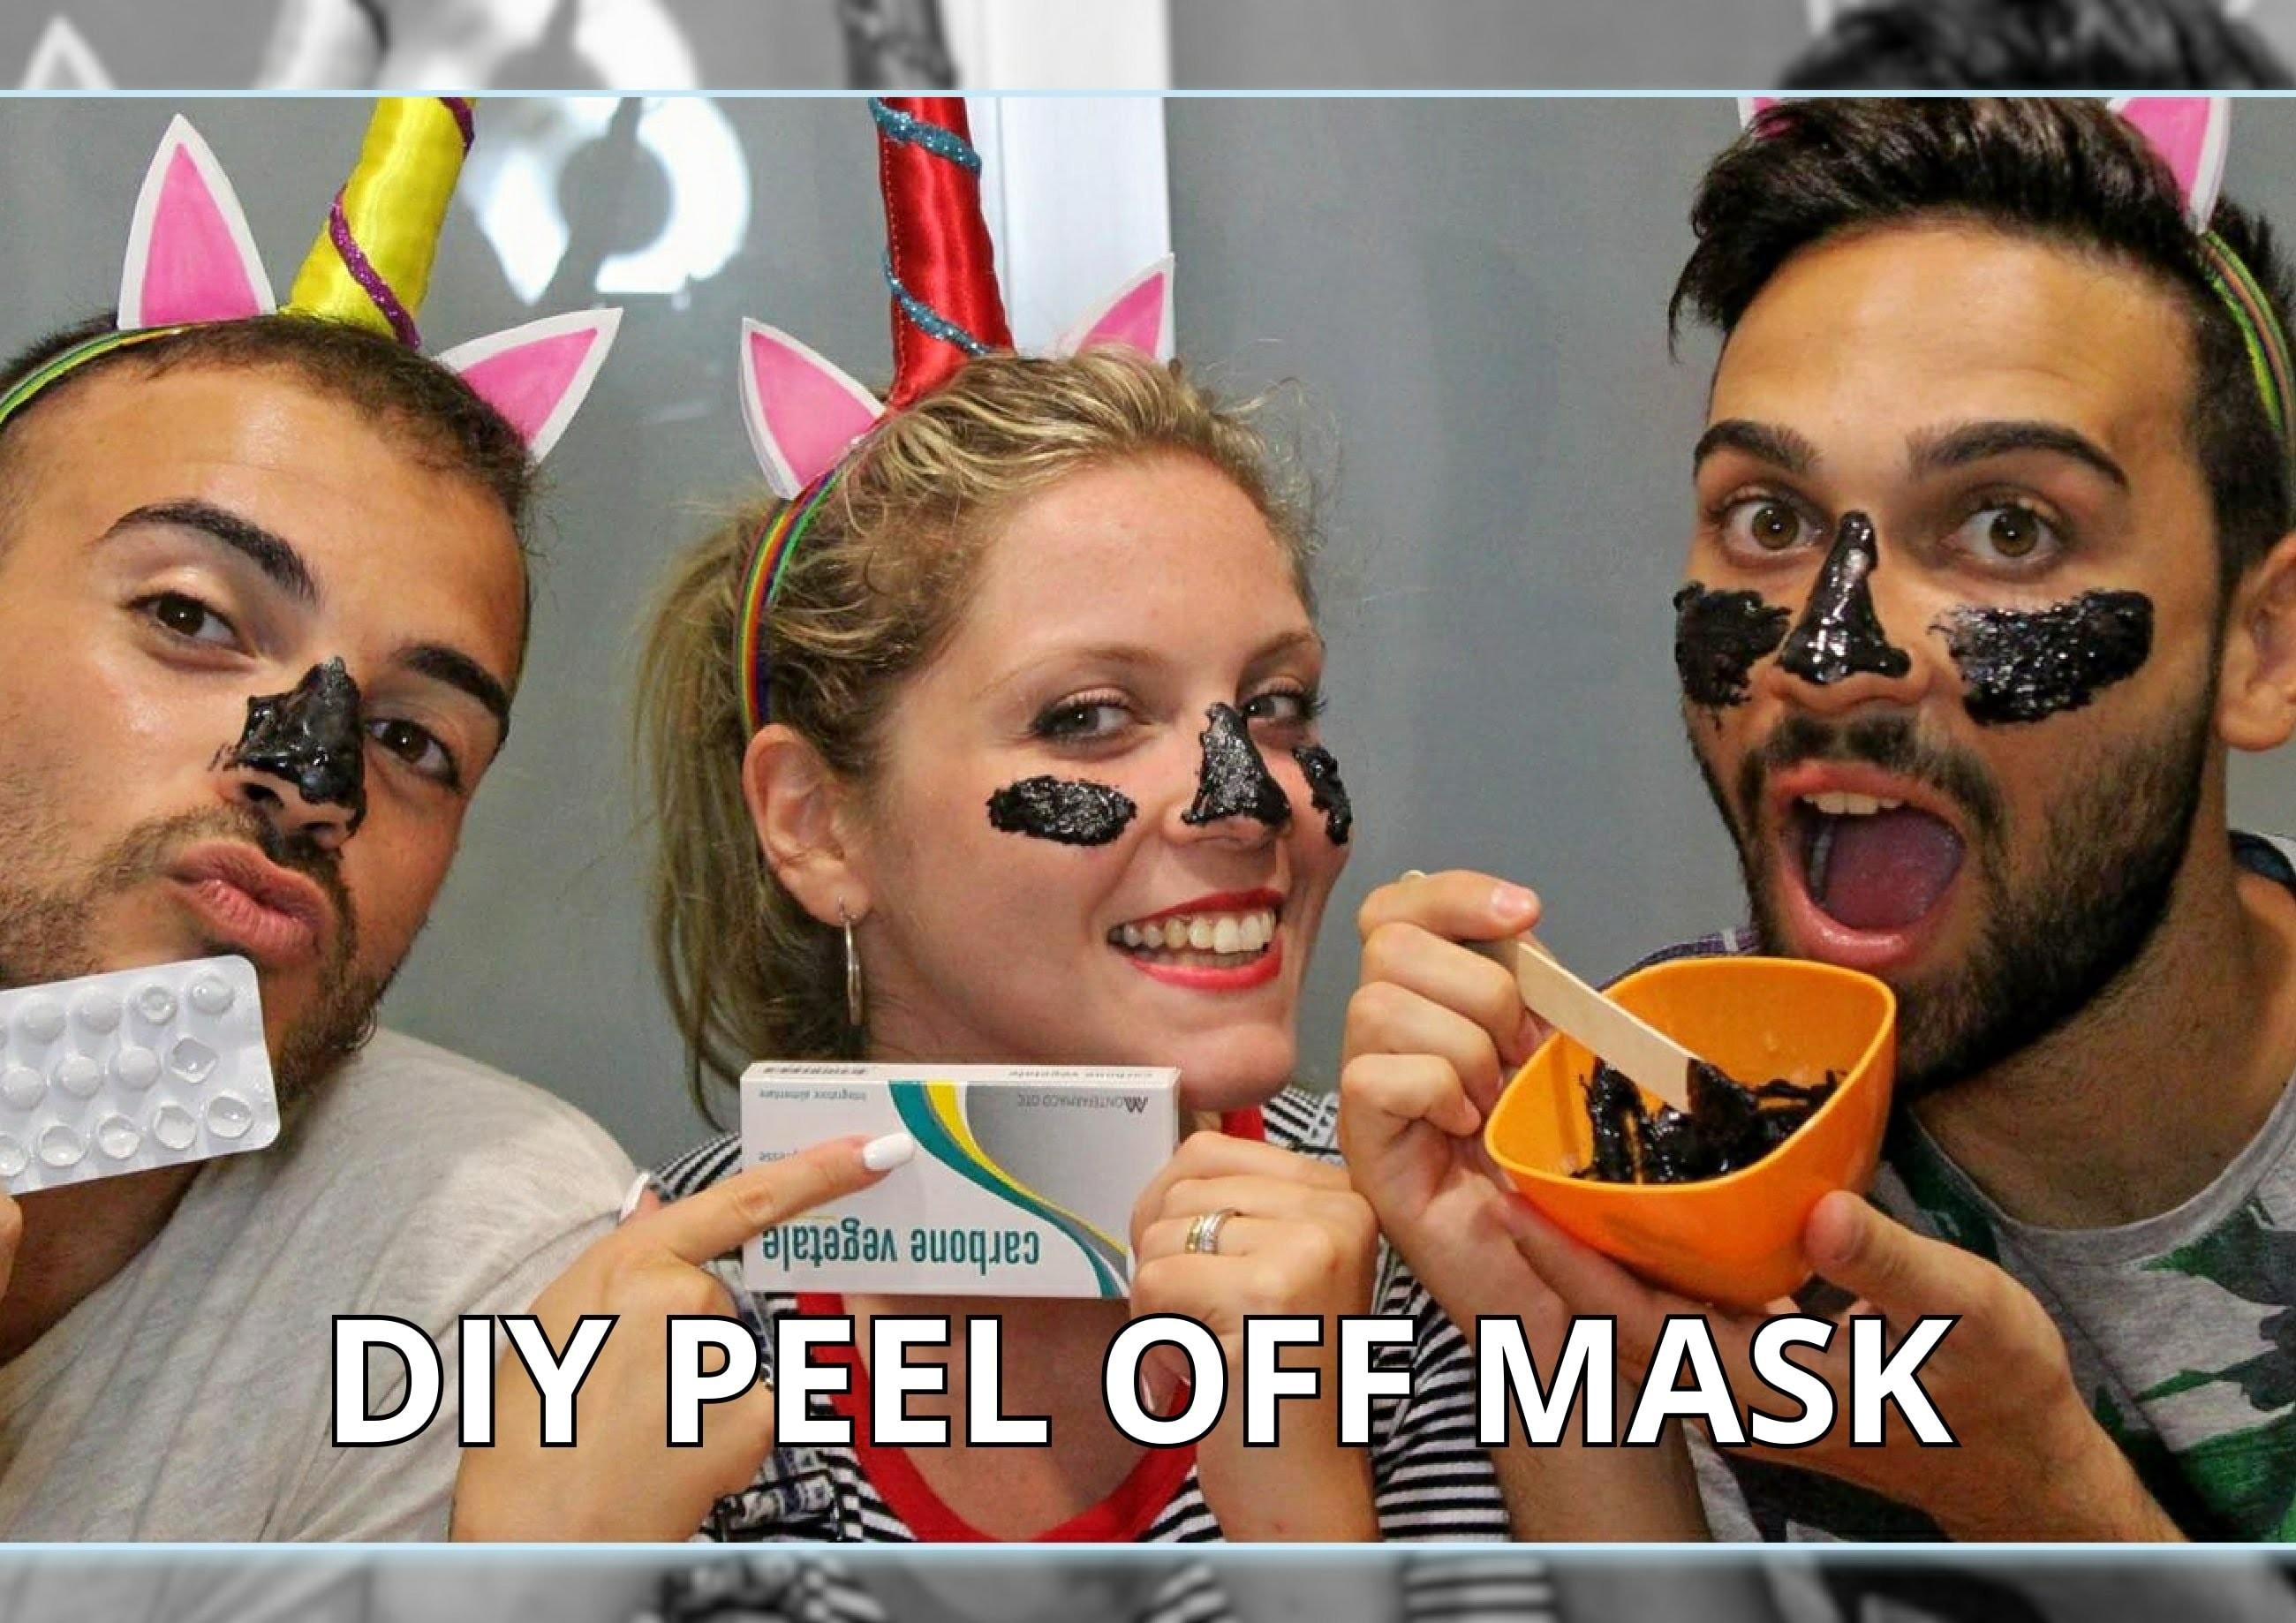 DIY MASCHERA PEEL OFF CON SOLI 3 INGREDIENTI!!! | TUTORIAL | THE UNICORNZ #weeklybeautydiy